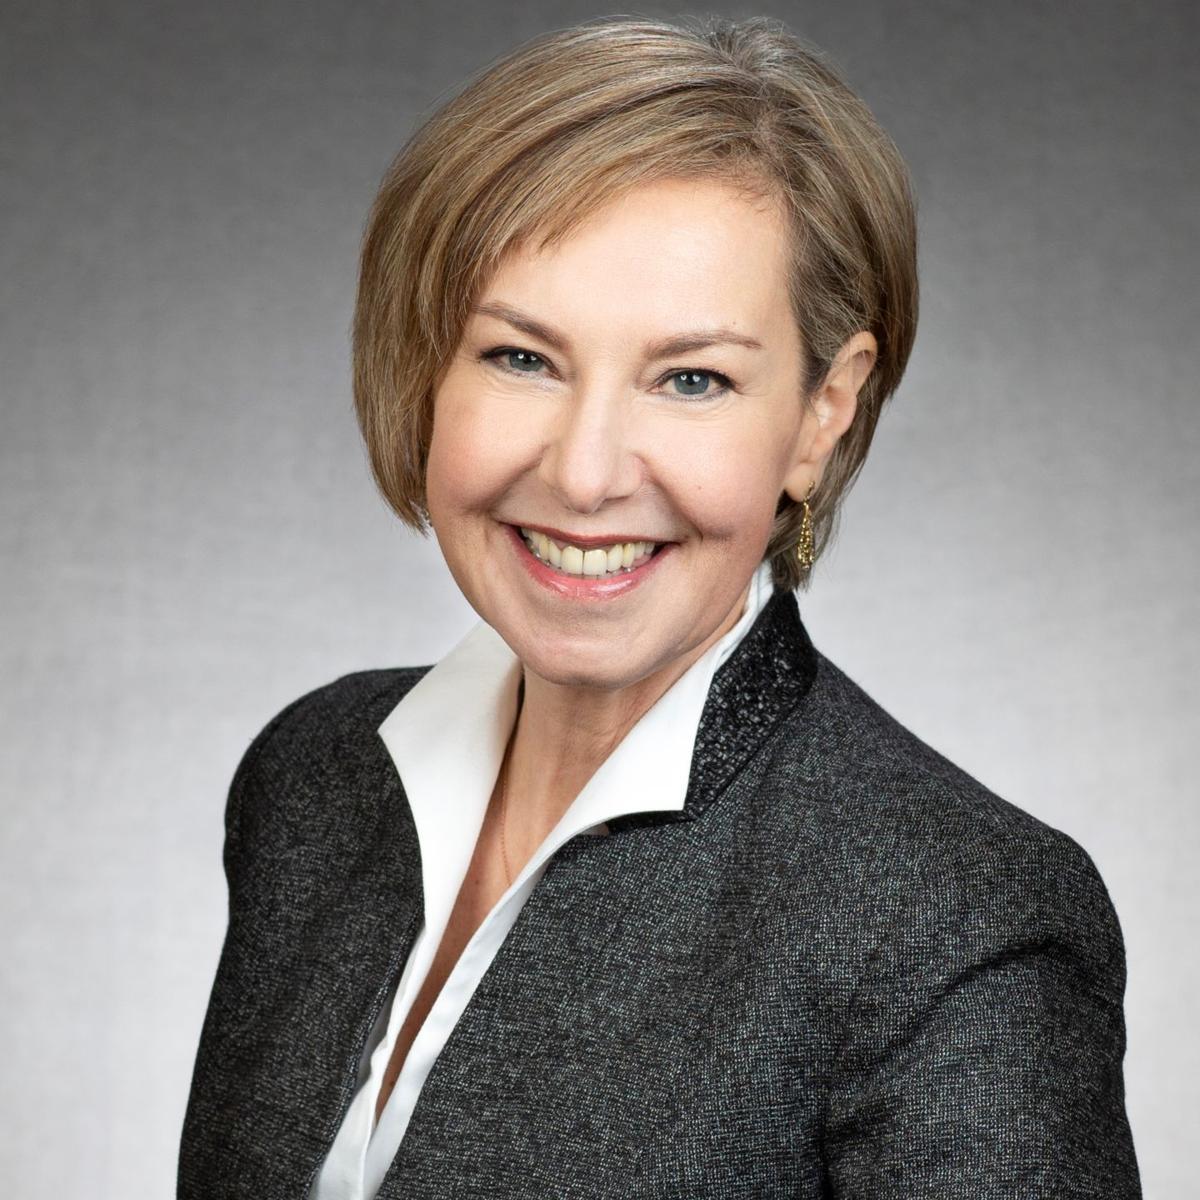 Cynthia O'Dell